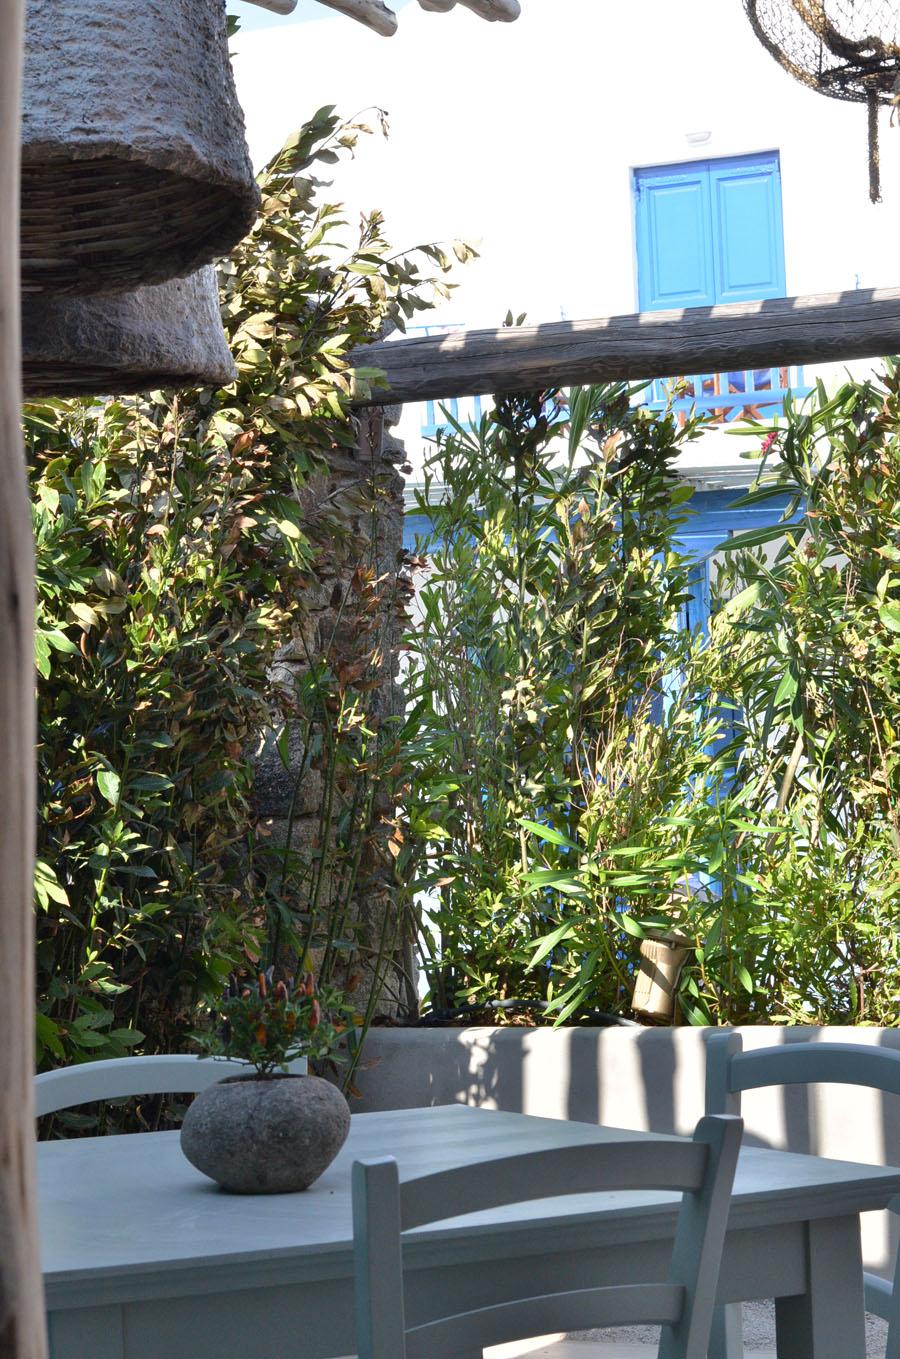 lovely Restaurant Decor in Mykonos, Greece - Stasha Travel and fashion Blog